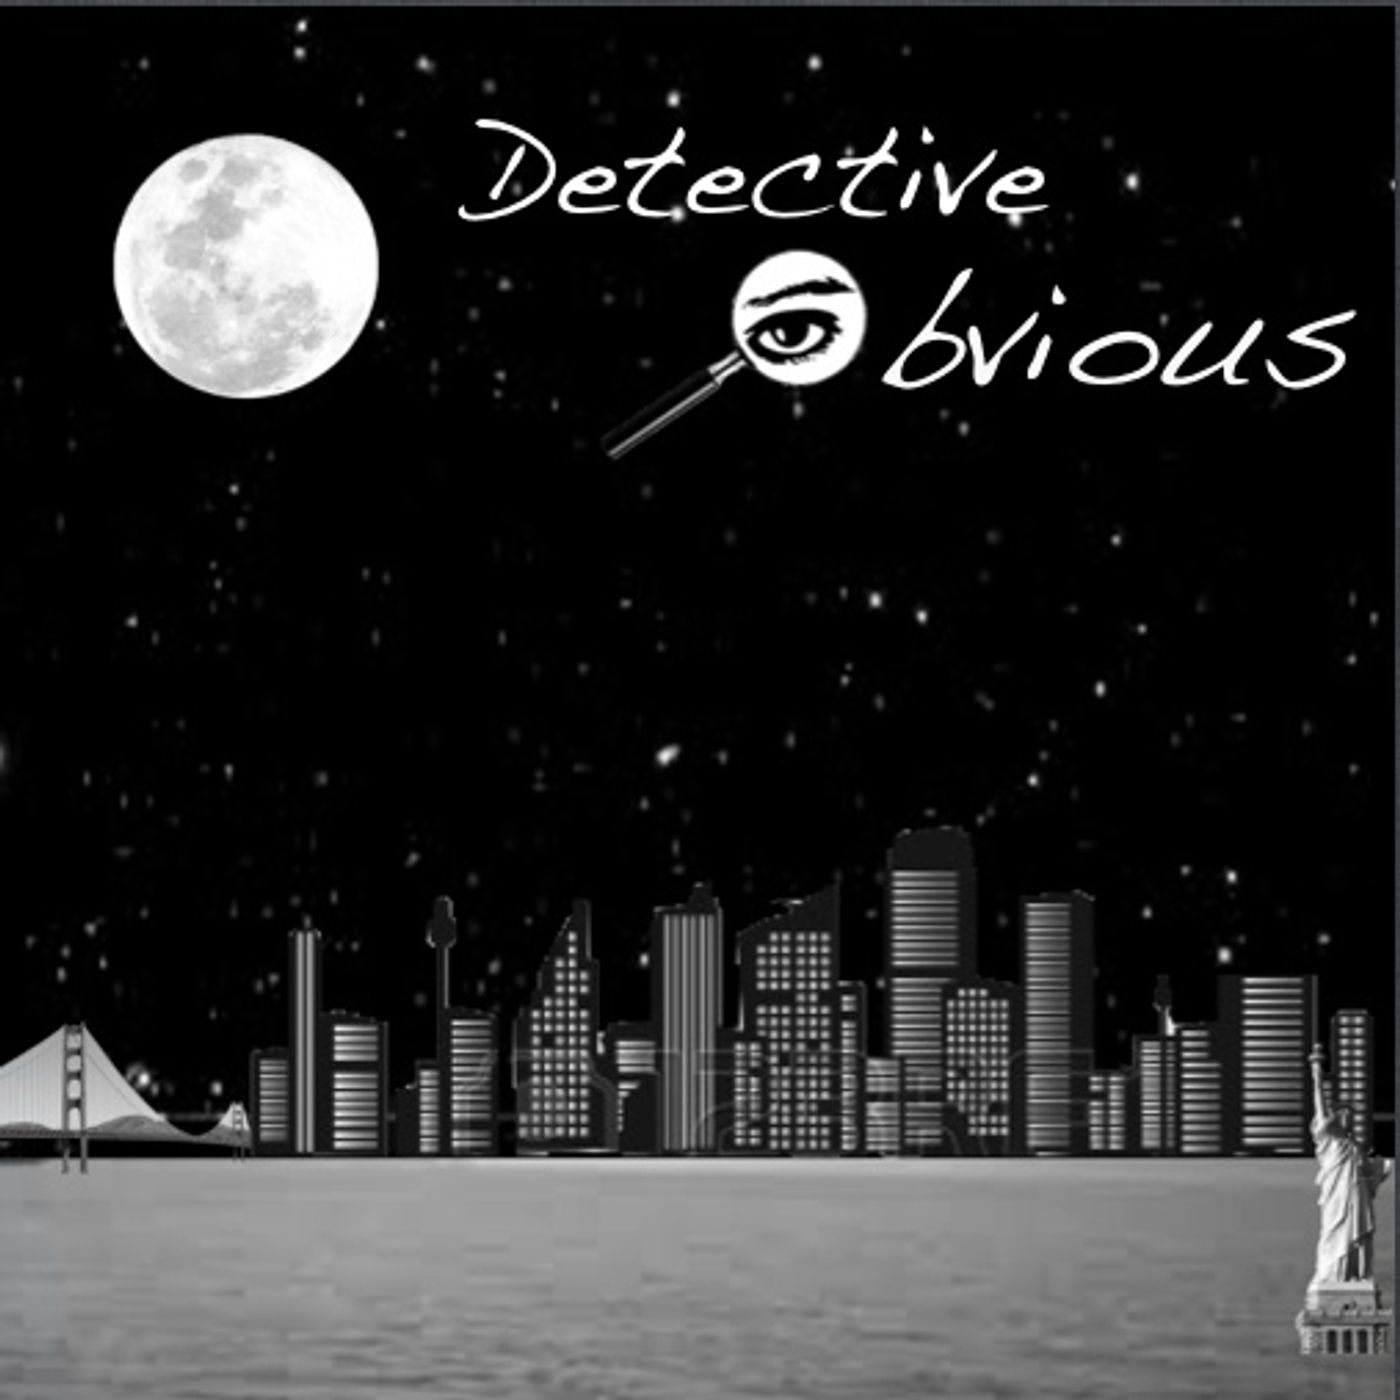 Detective Obvious